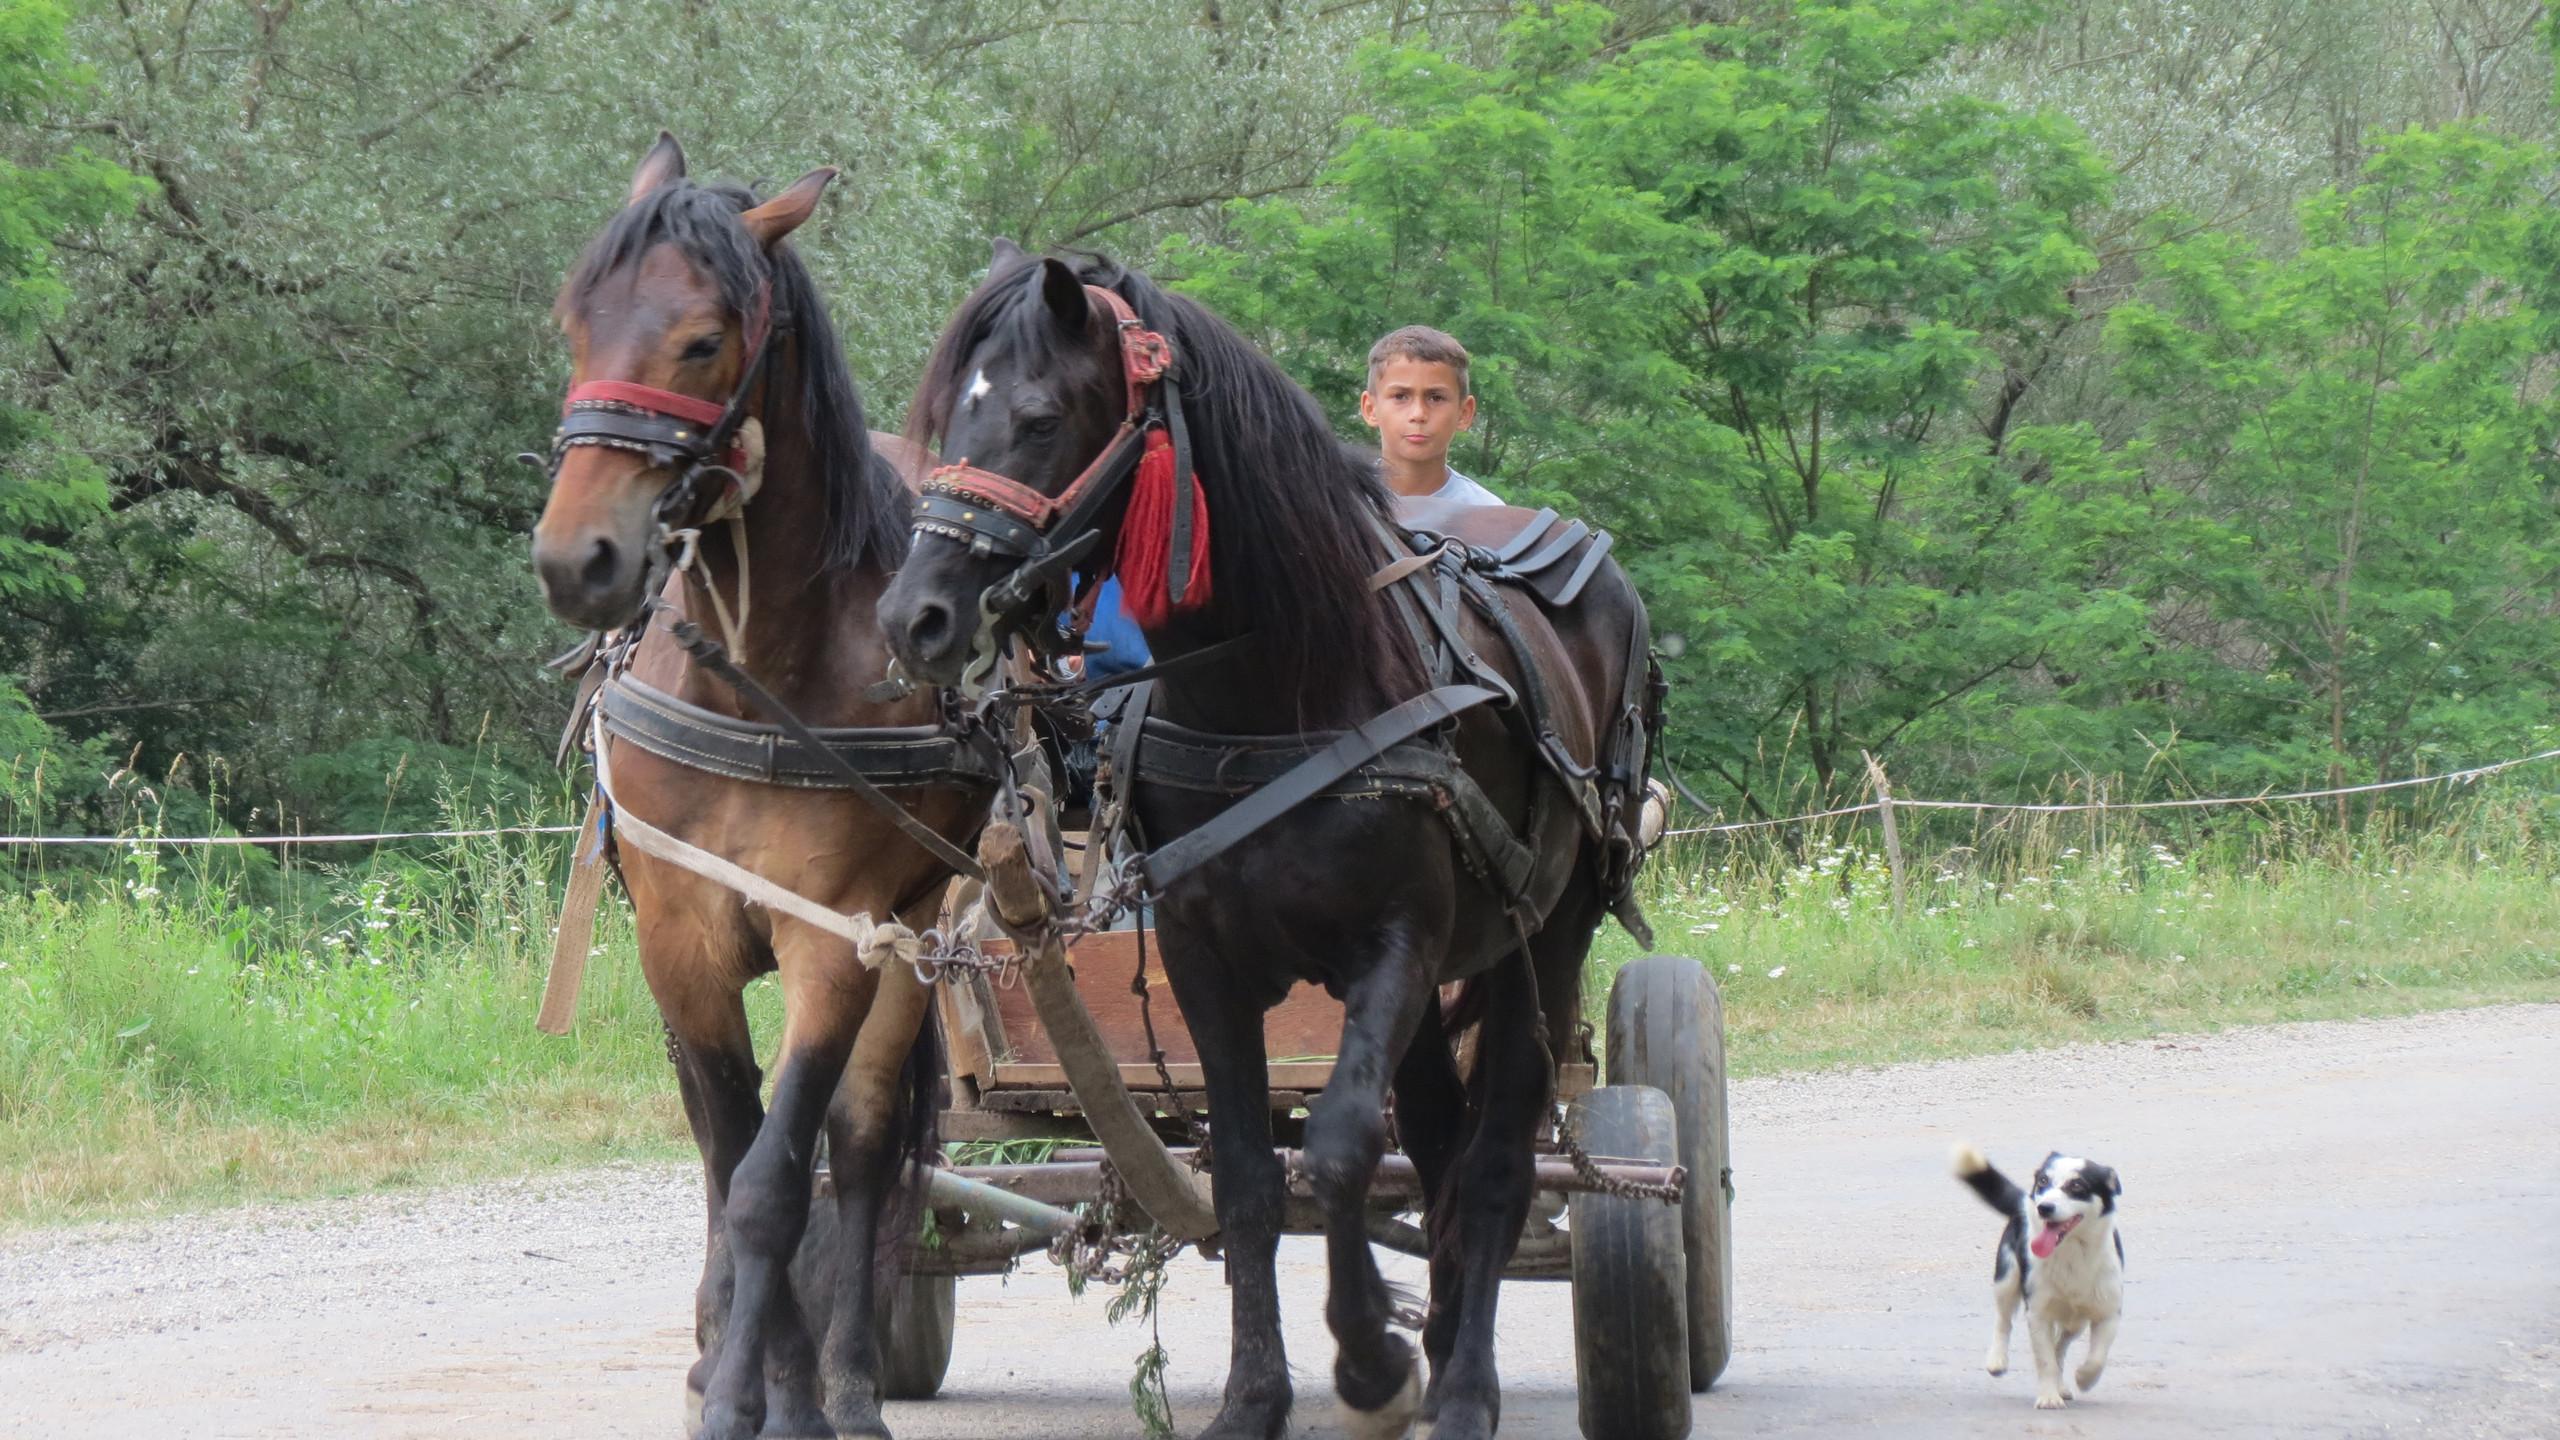 052_-_On_the_road_near_Copșa_Mare